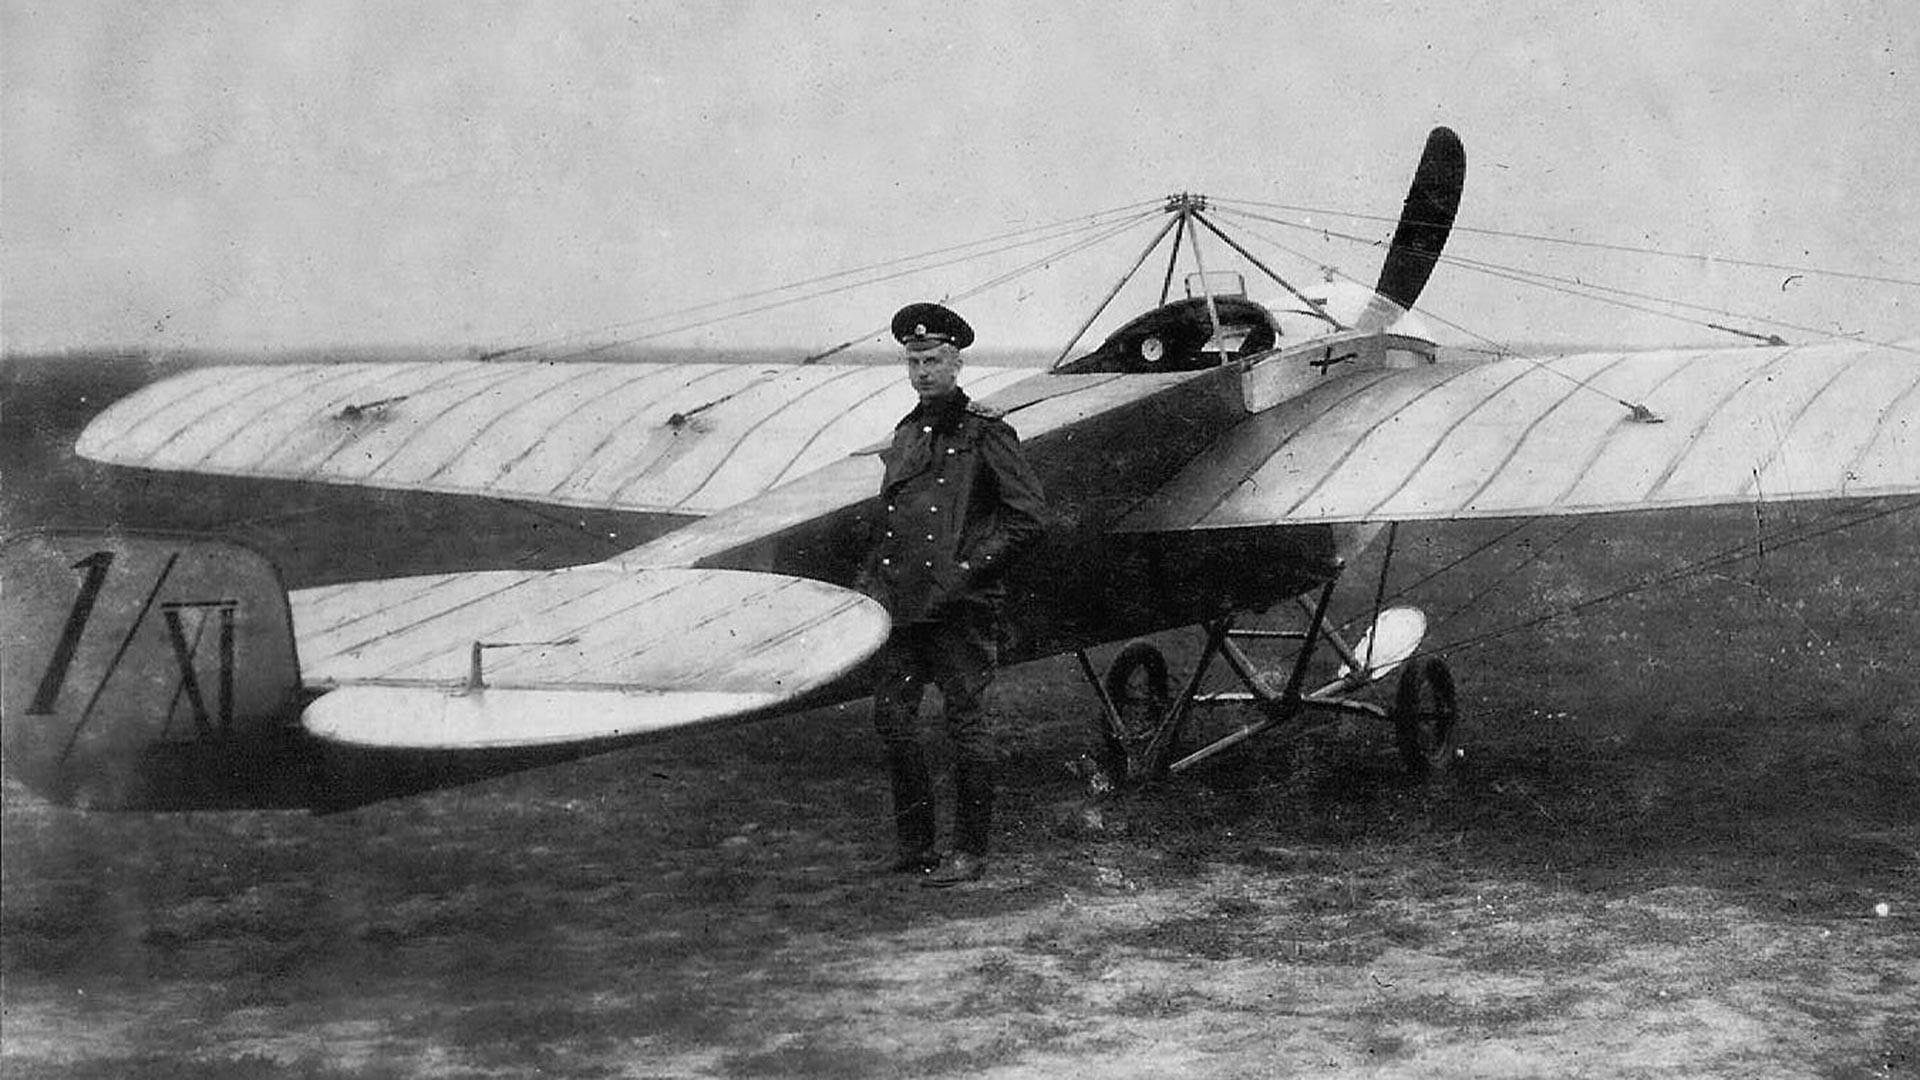 Pyotr Nesterov et le Nieuport IV